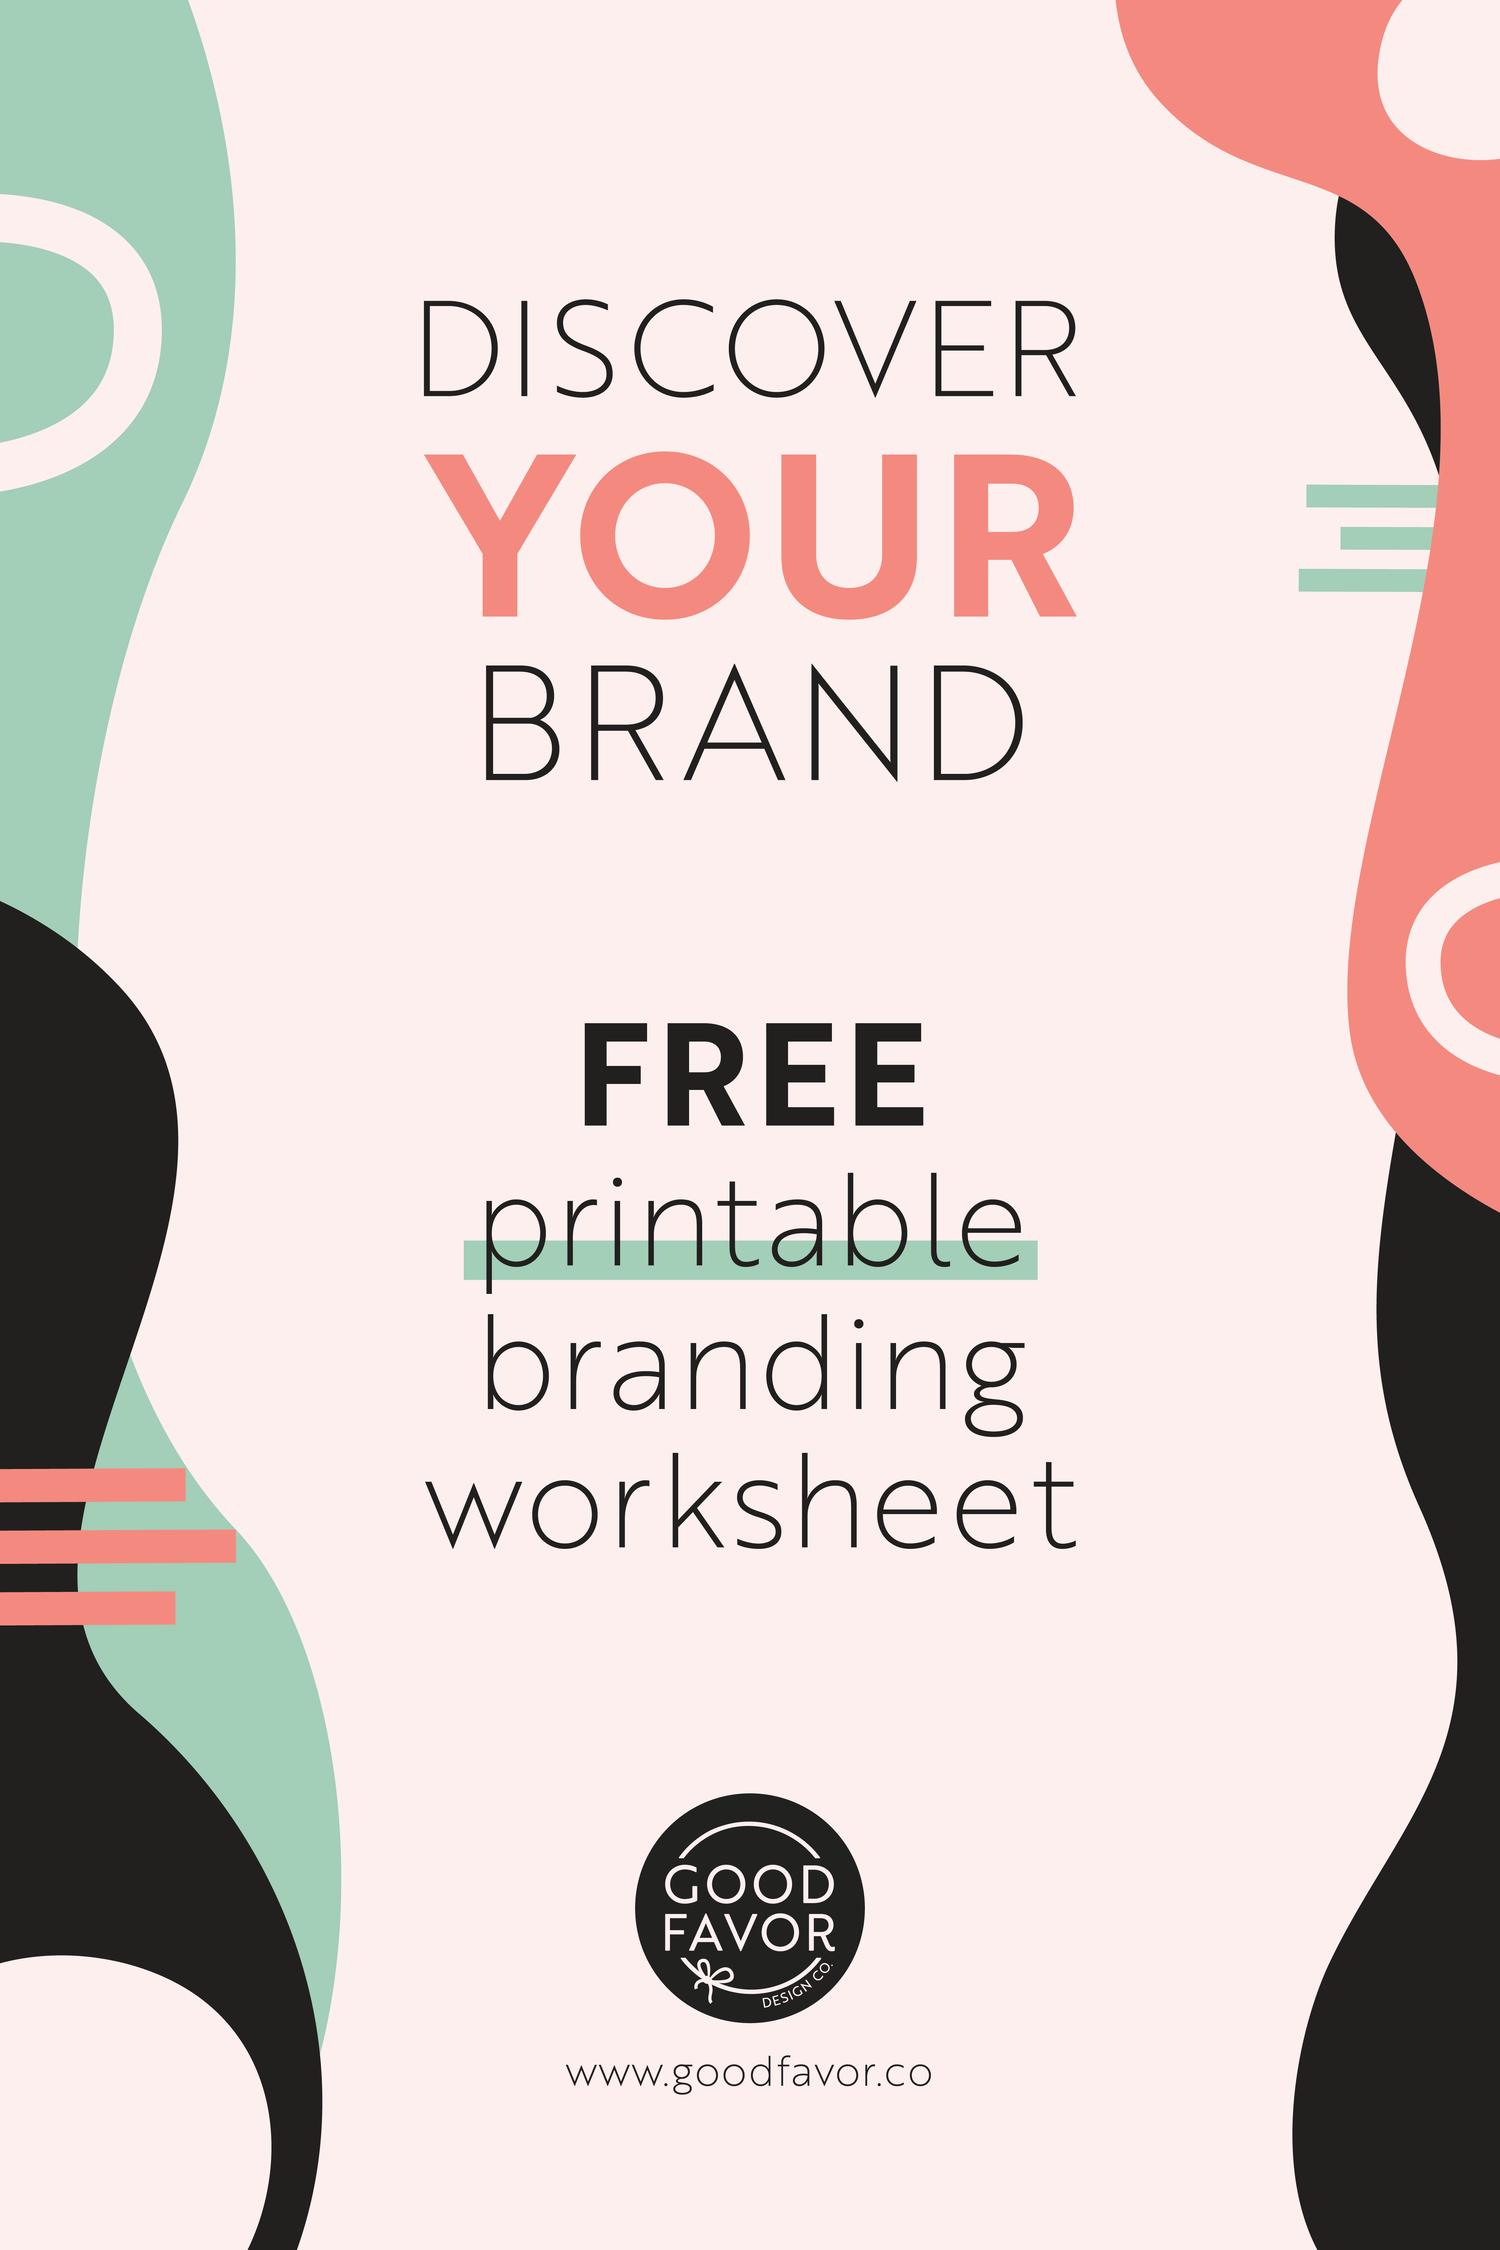 Free Printable Branding Worksheet Good Favor Co